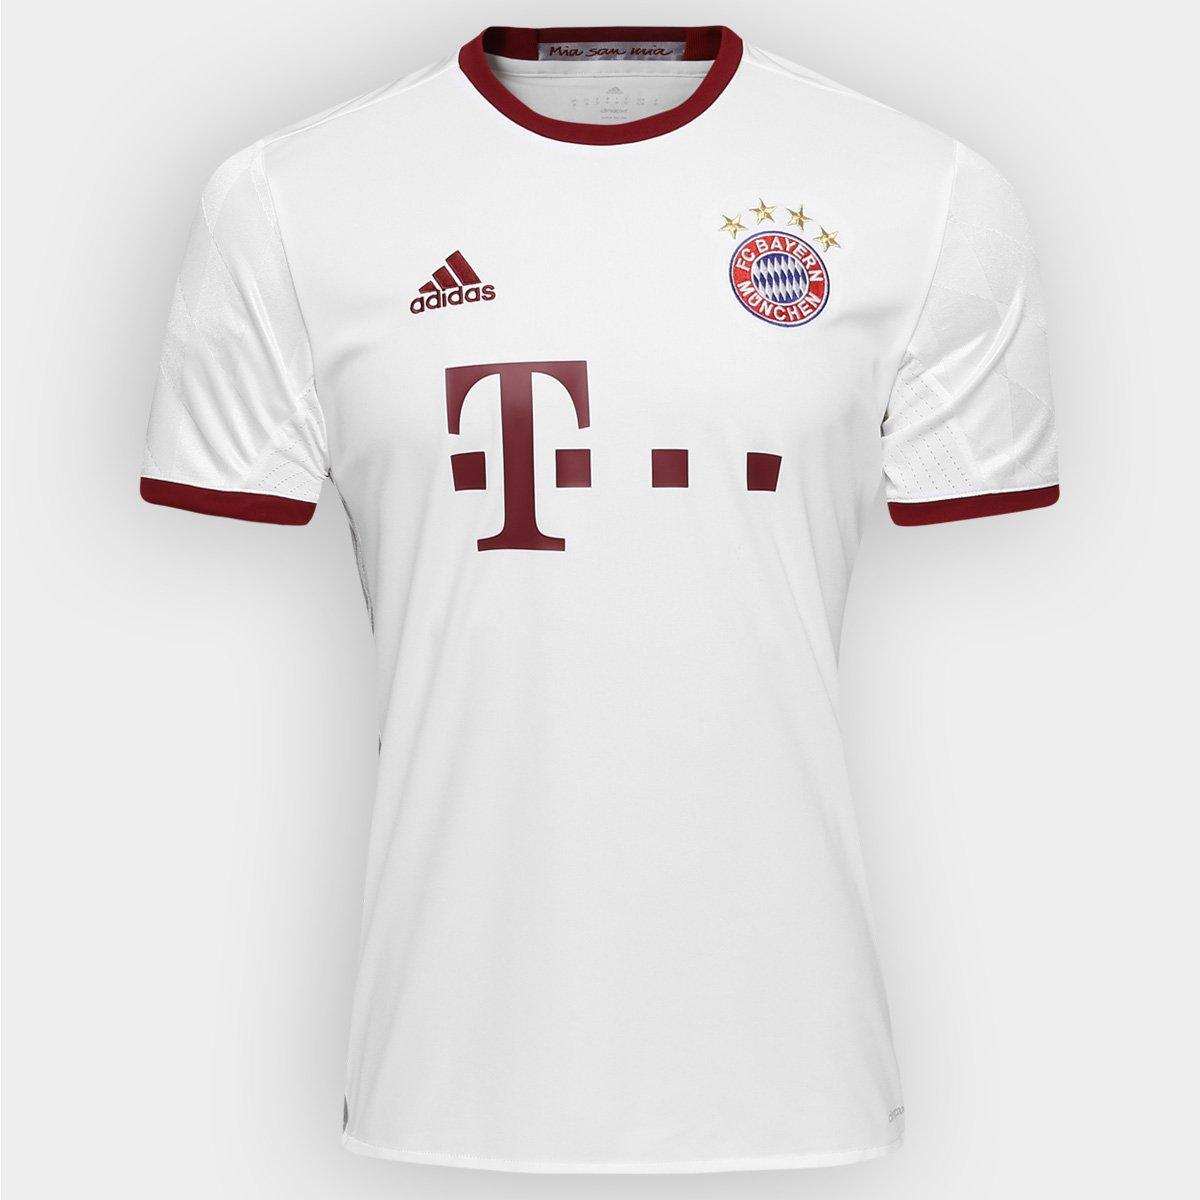 Camisa Bayern de Munique Third 16 17 s nº Torcedor Adidas Masculina -  Compre Agora  ab1fa5380772a